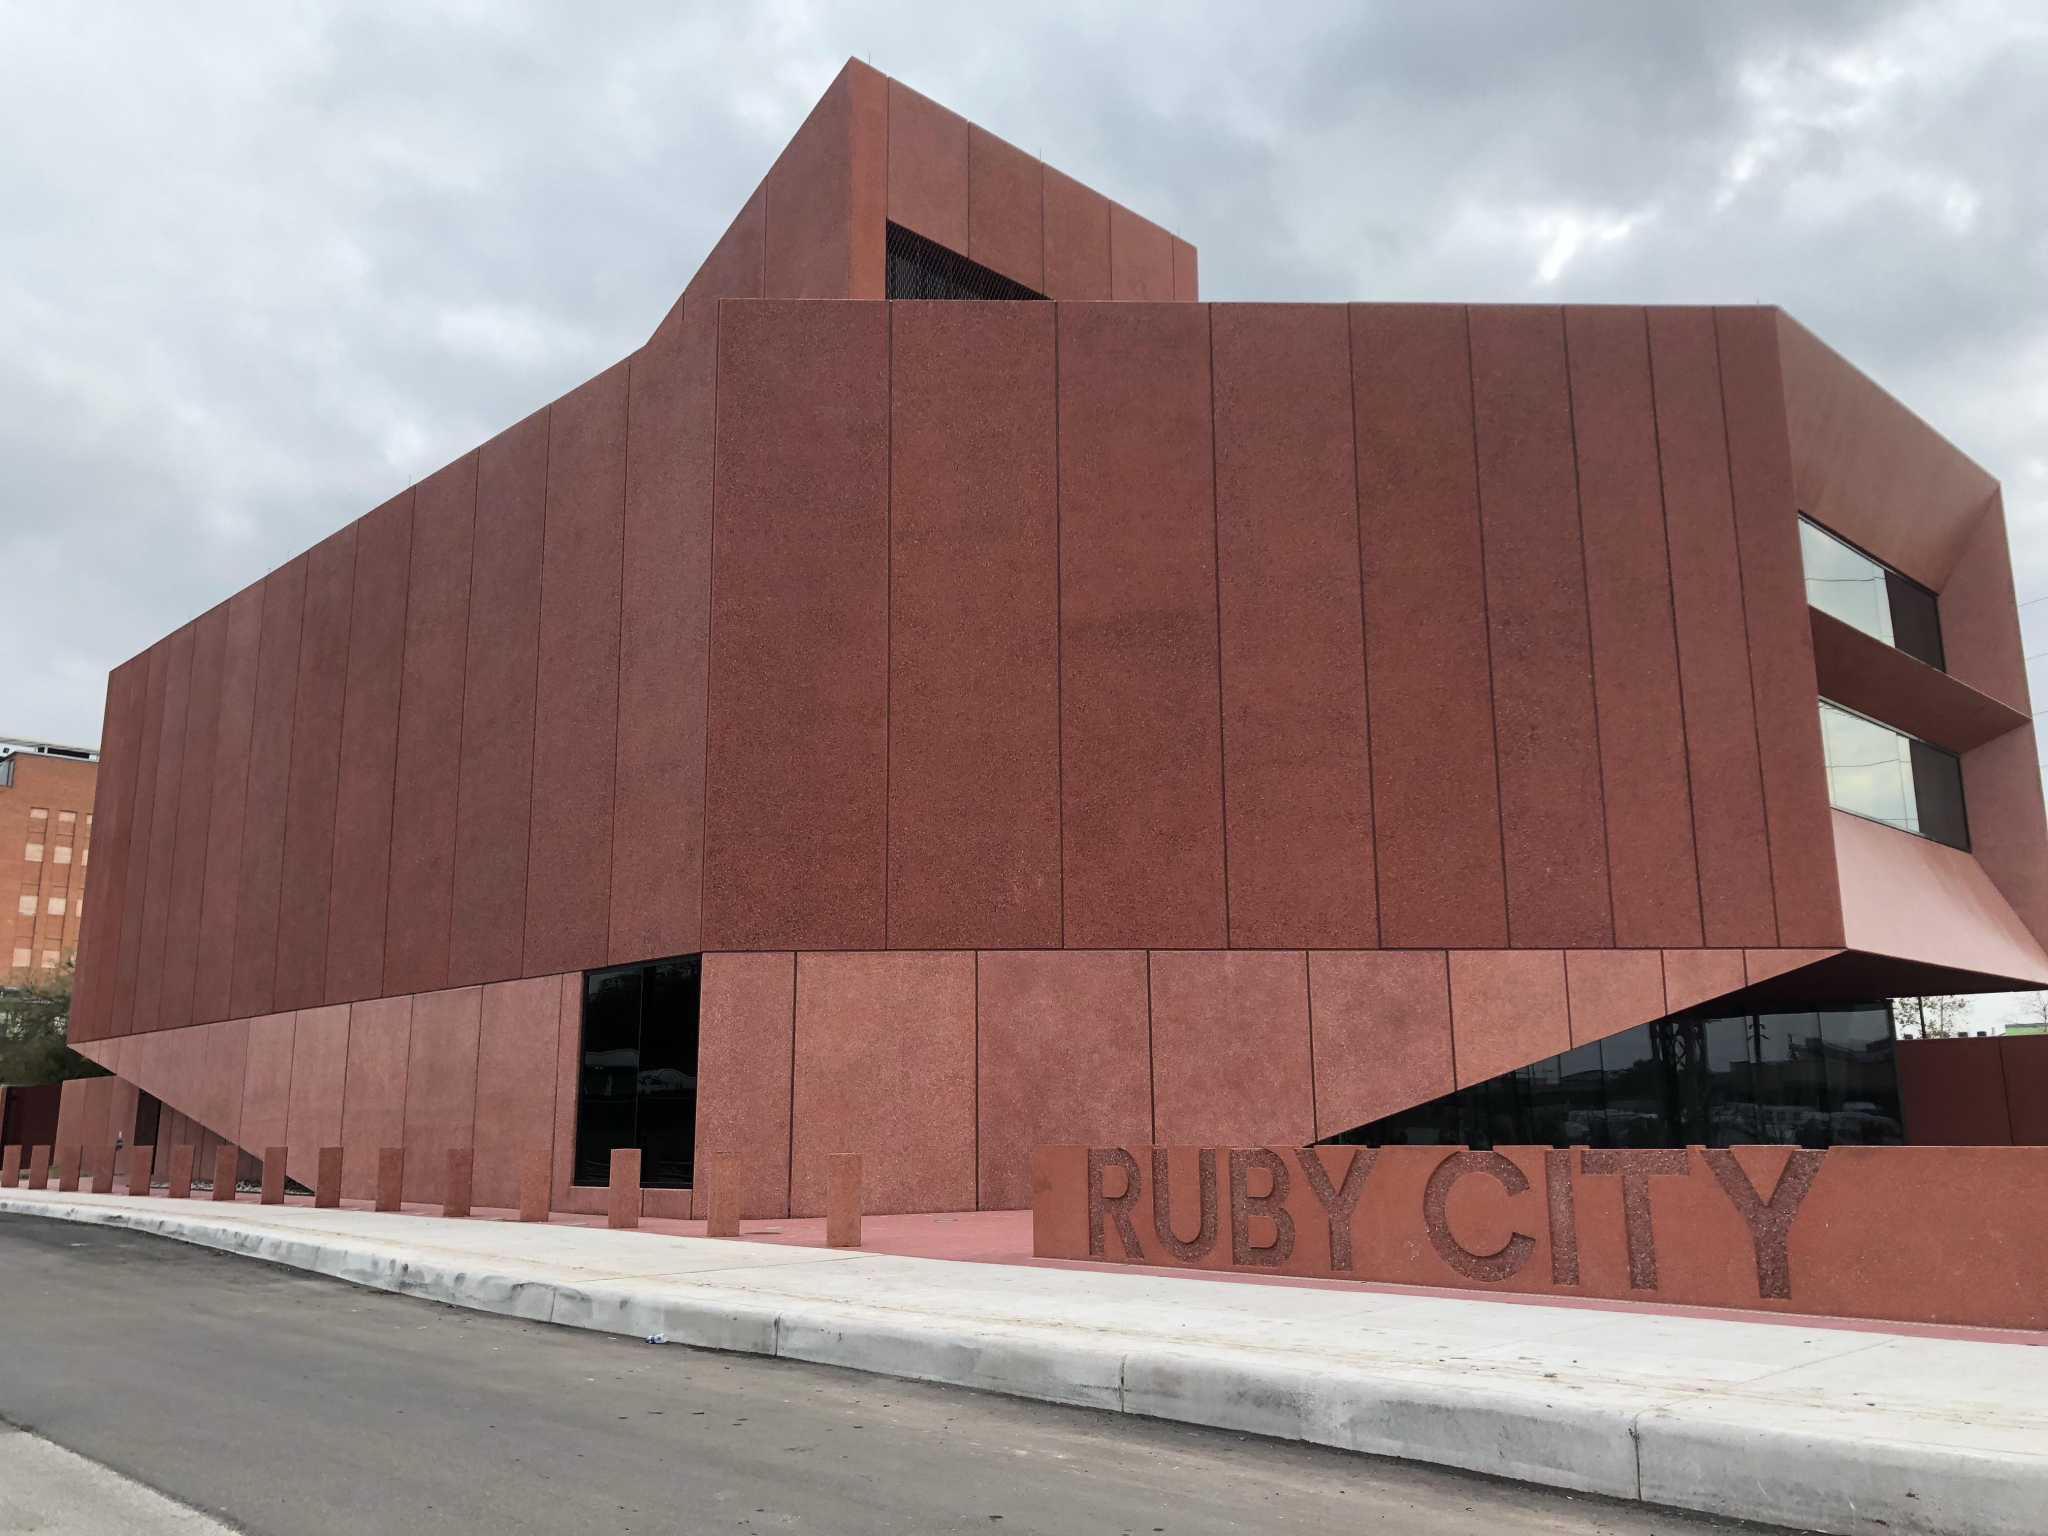 Ruby City contemporary art museum in San Antonio announces inaugural exhibits